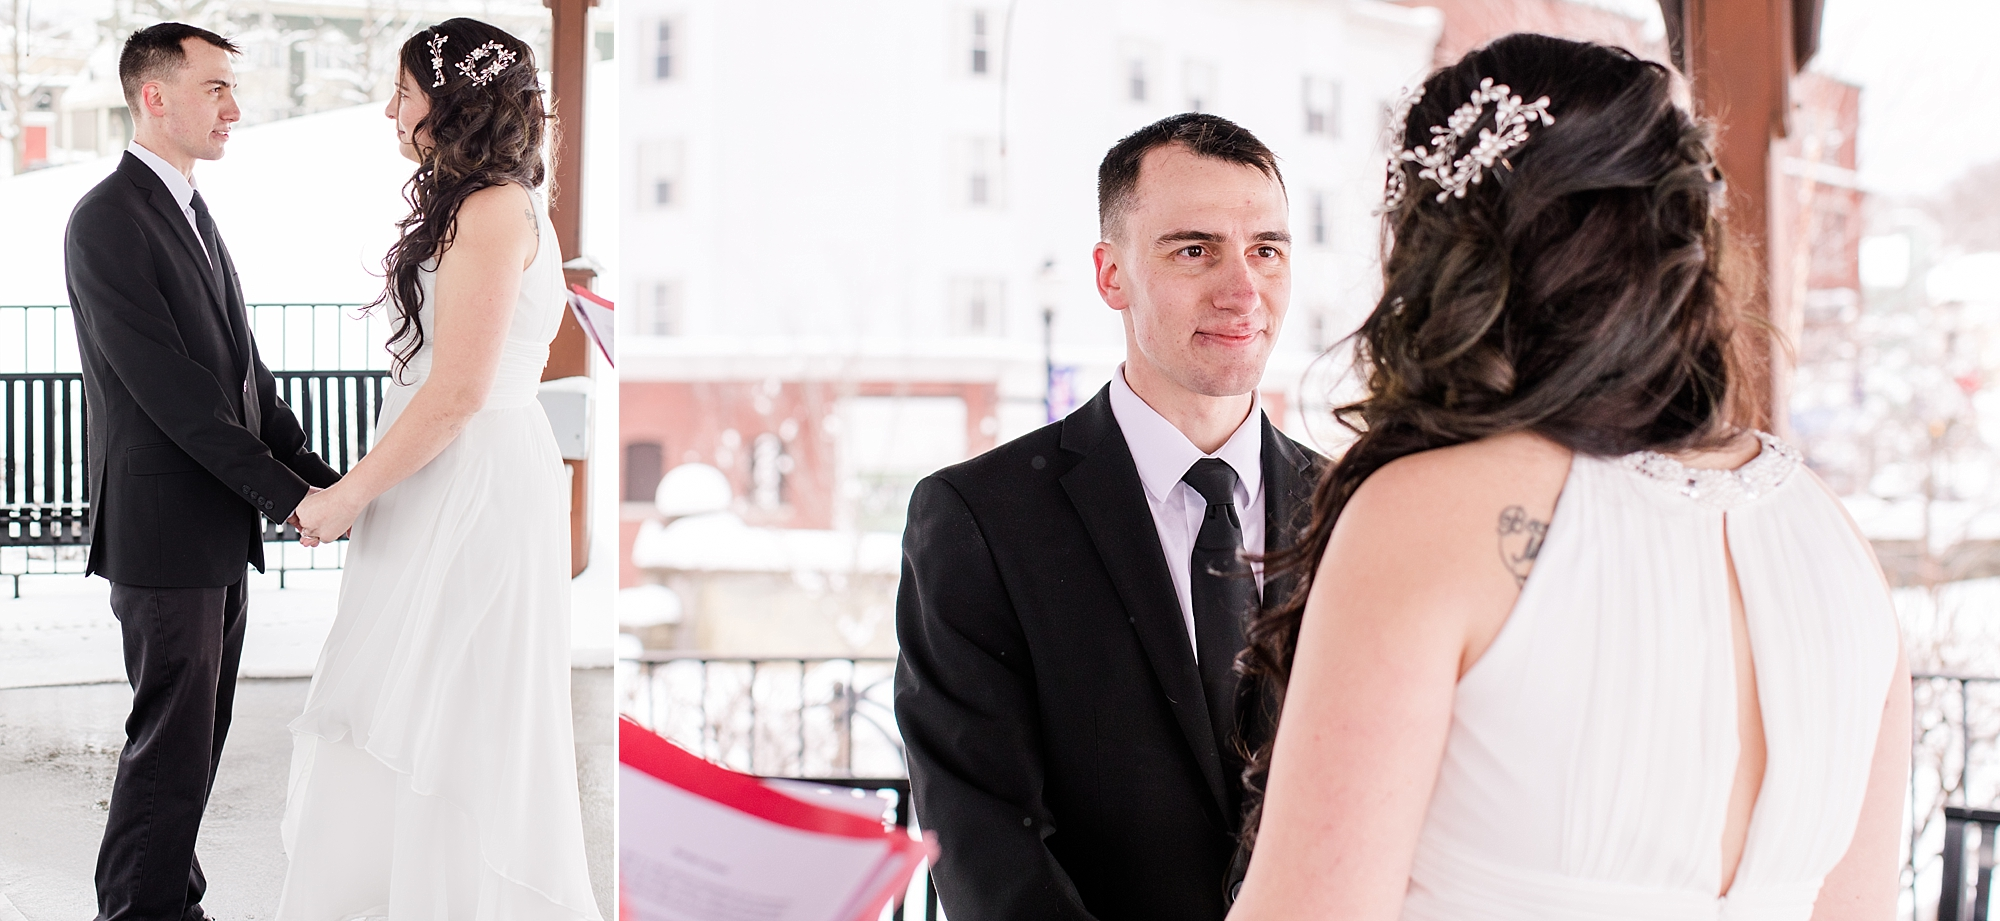 eisleyimages-downtown-marlboro-wedding-newengland_0016.jpg